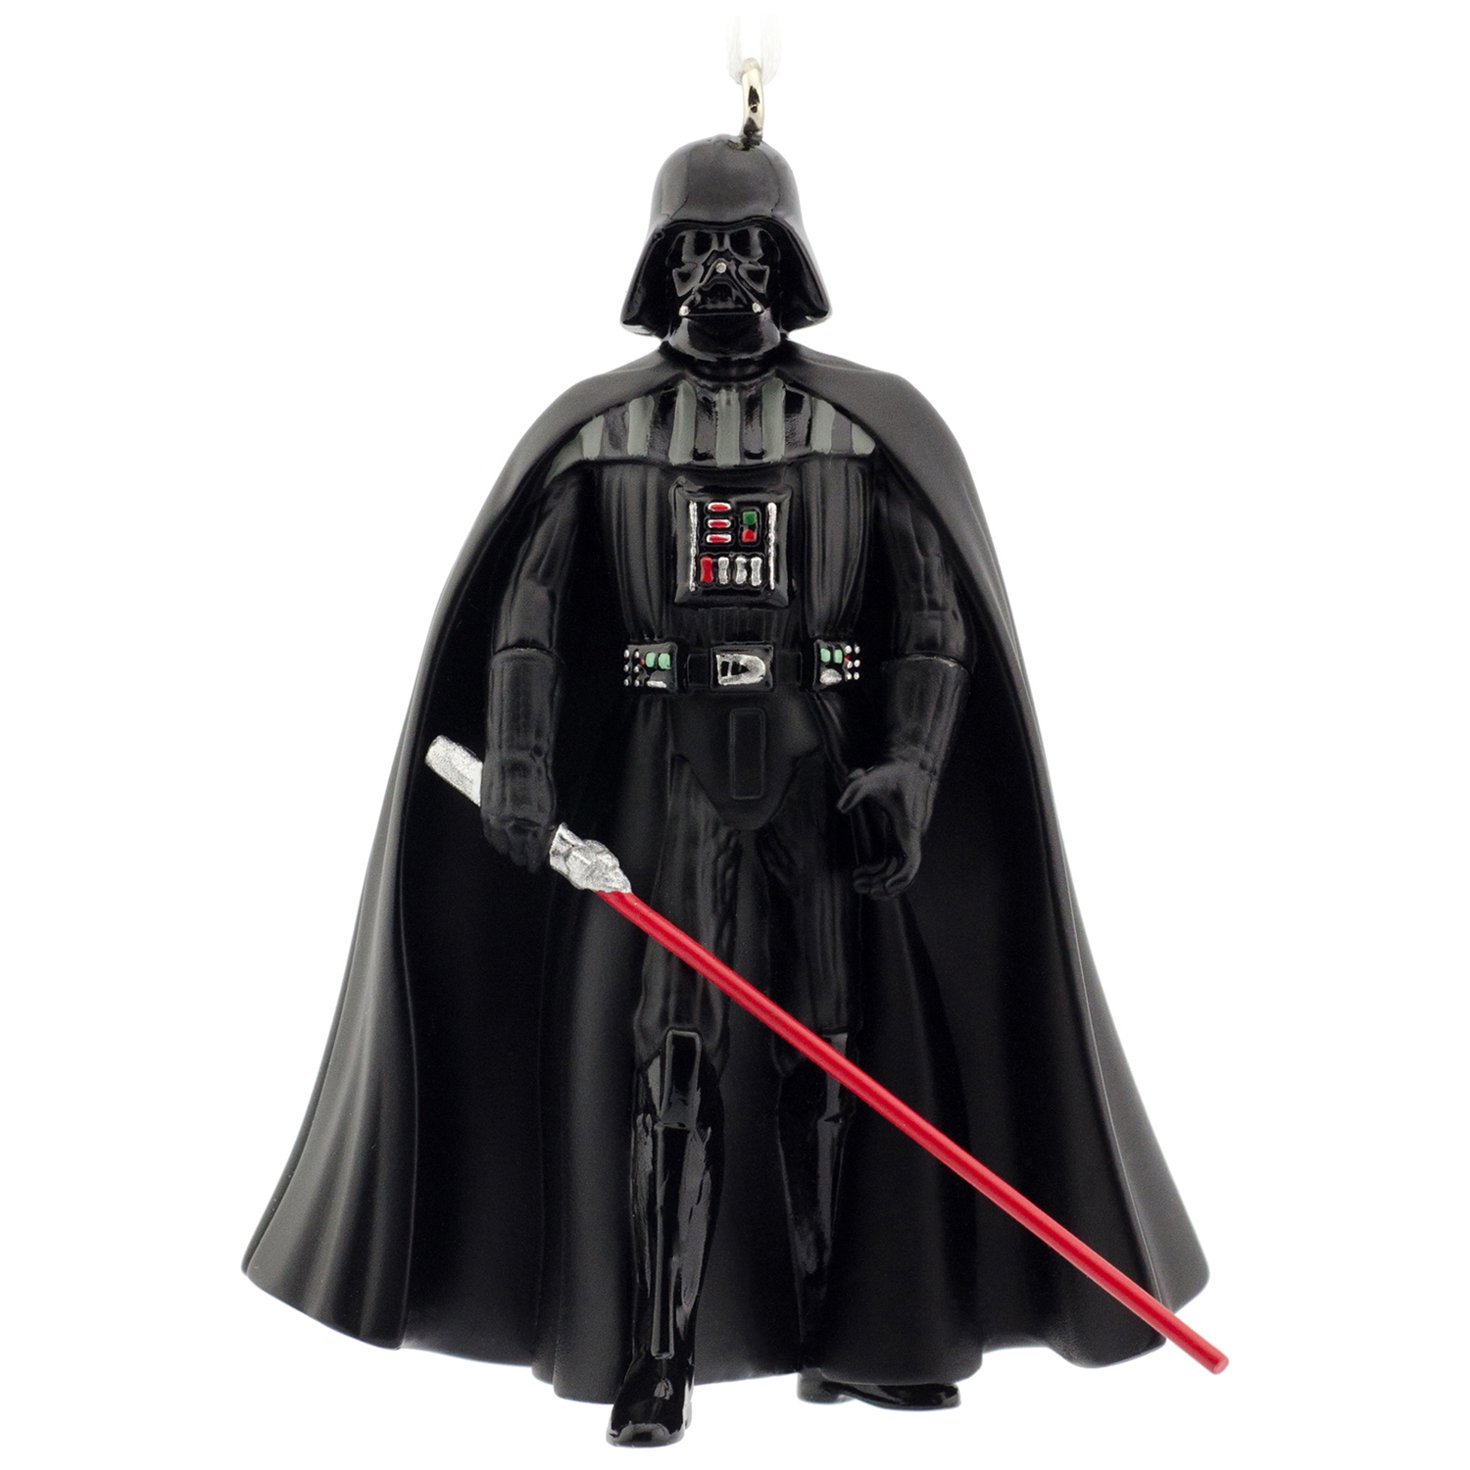 Amazon.com: Hallmark Star Wars Darth Vader Christmas Ornament ...